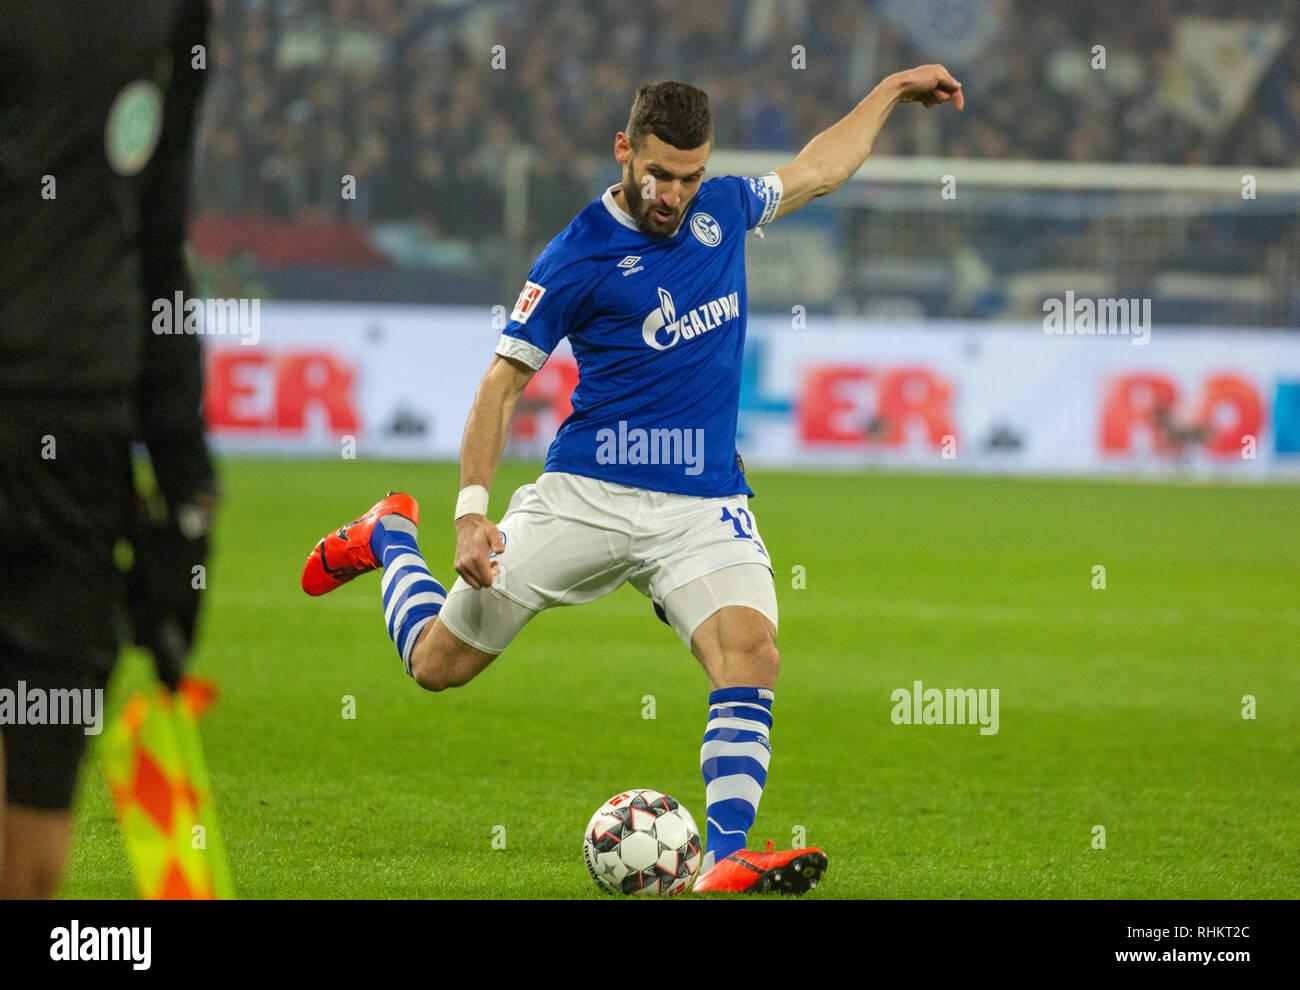 sports, football, Bundesliga, 2018/2019, FC Schalke 04 vs Borussia Moenchengladbach 0-2, Veltins Arena Gelsenkirchen, scene of the match, cross by Daniel Caligiuri (S04), DFL REGULATIONS PROHIBIT ANY USE OF PHOTOGRAPHS AS IMAGE SEQUENCES AND/OR QUASI-VIDEO - Stock Image